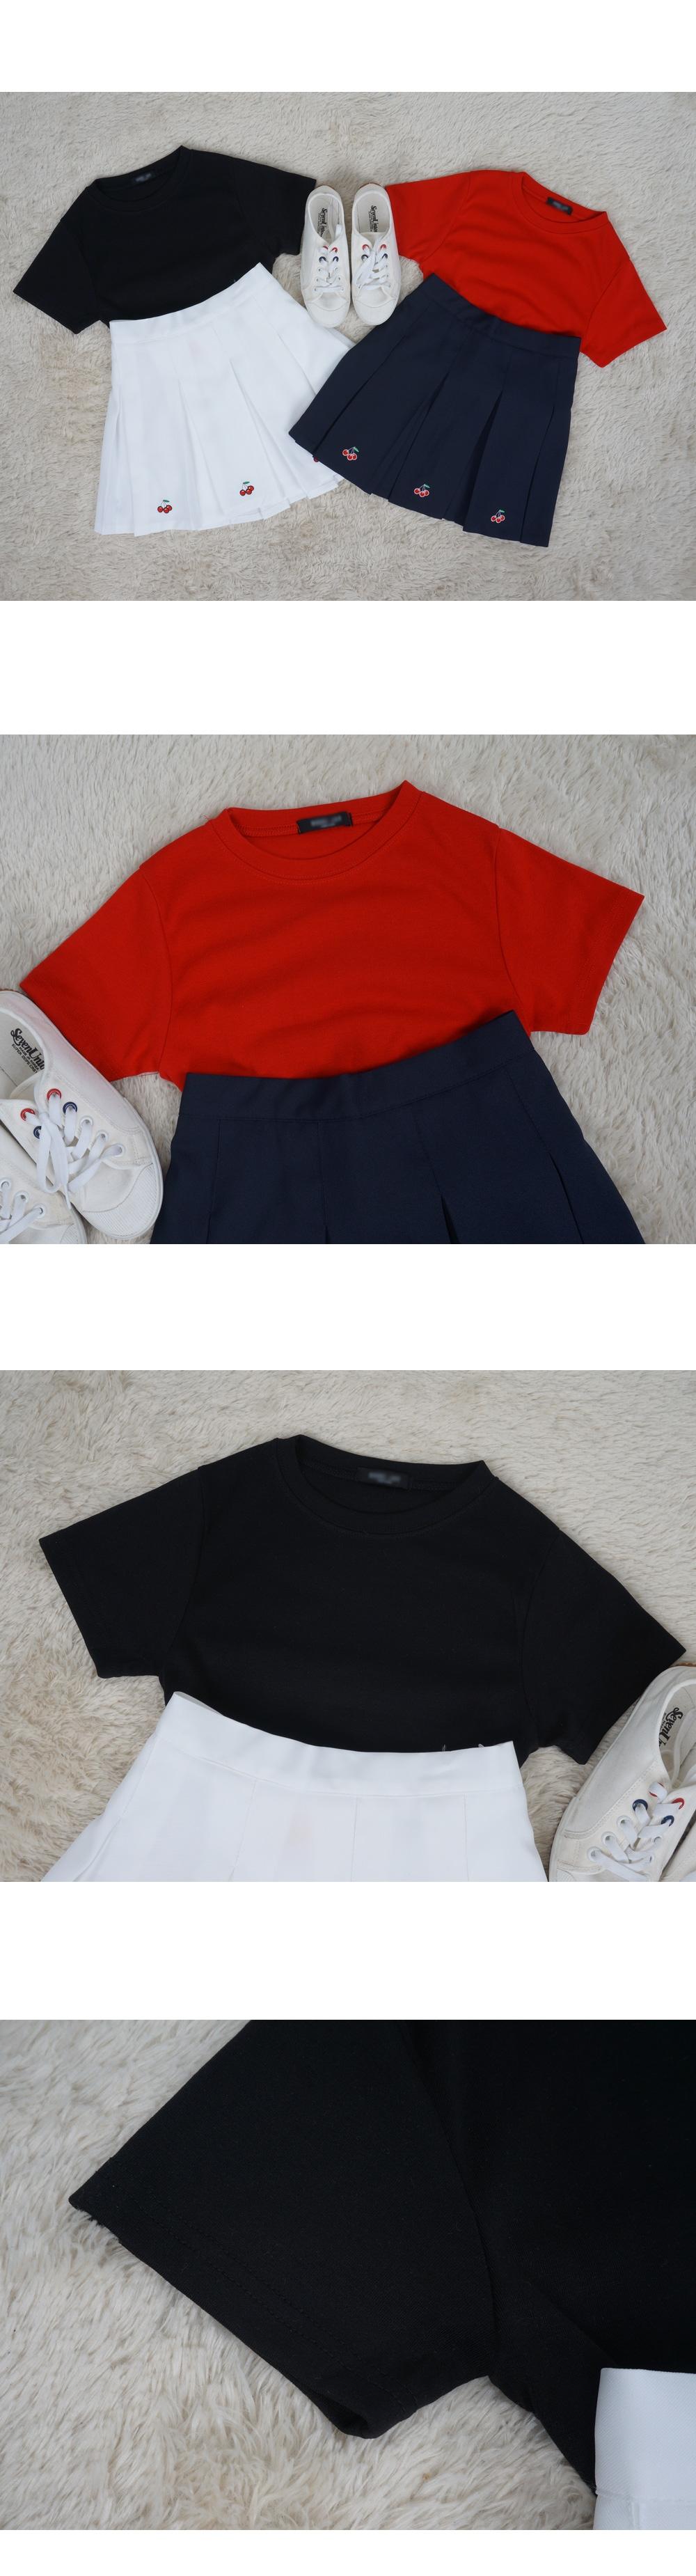 Short-sleeved T-shirt short sleeves T